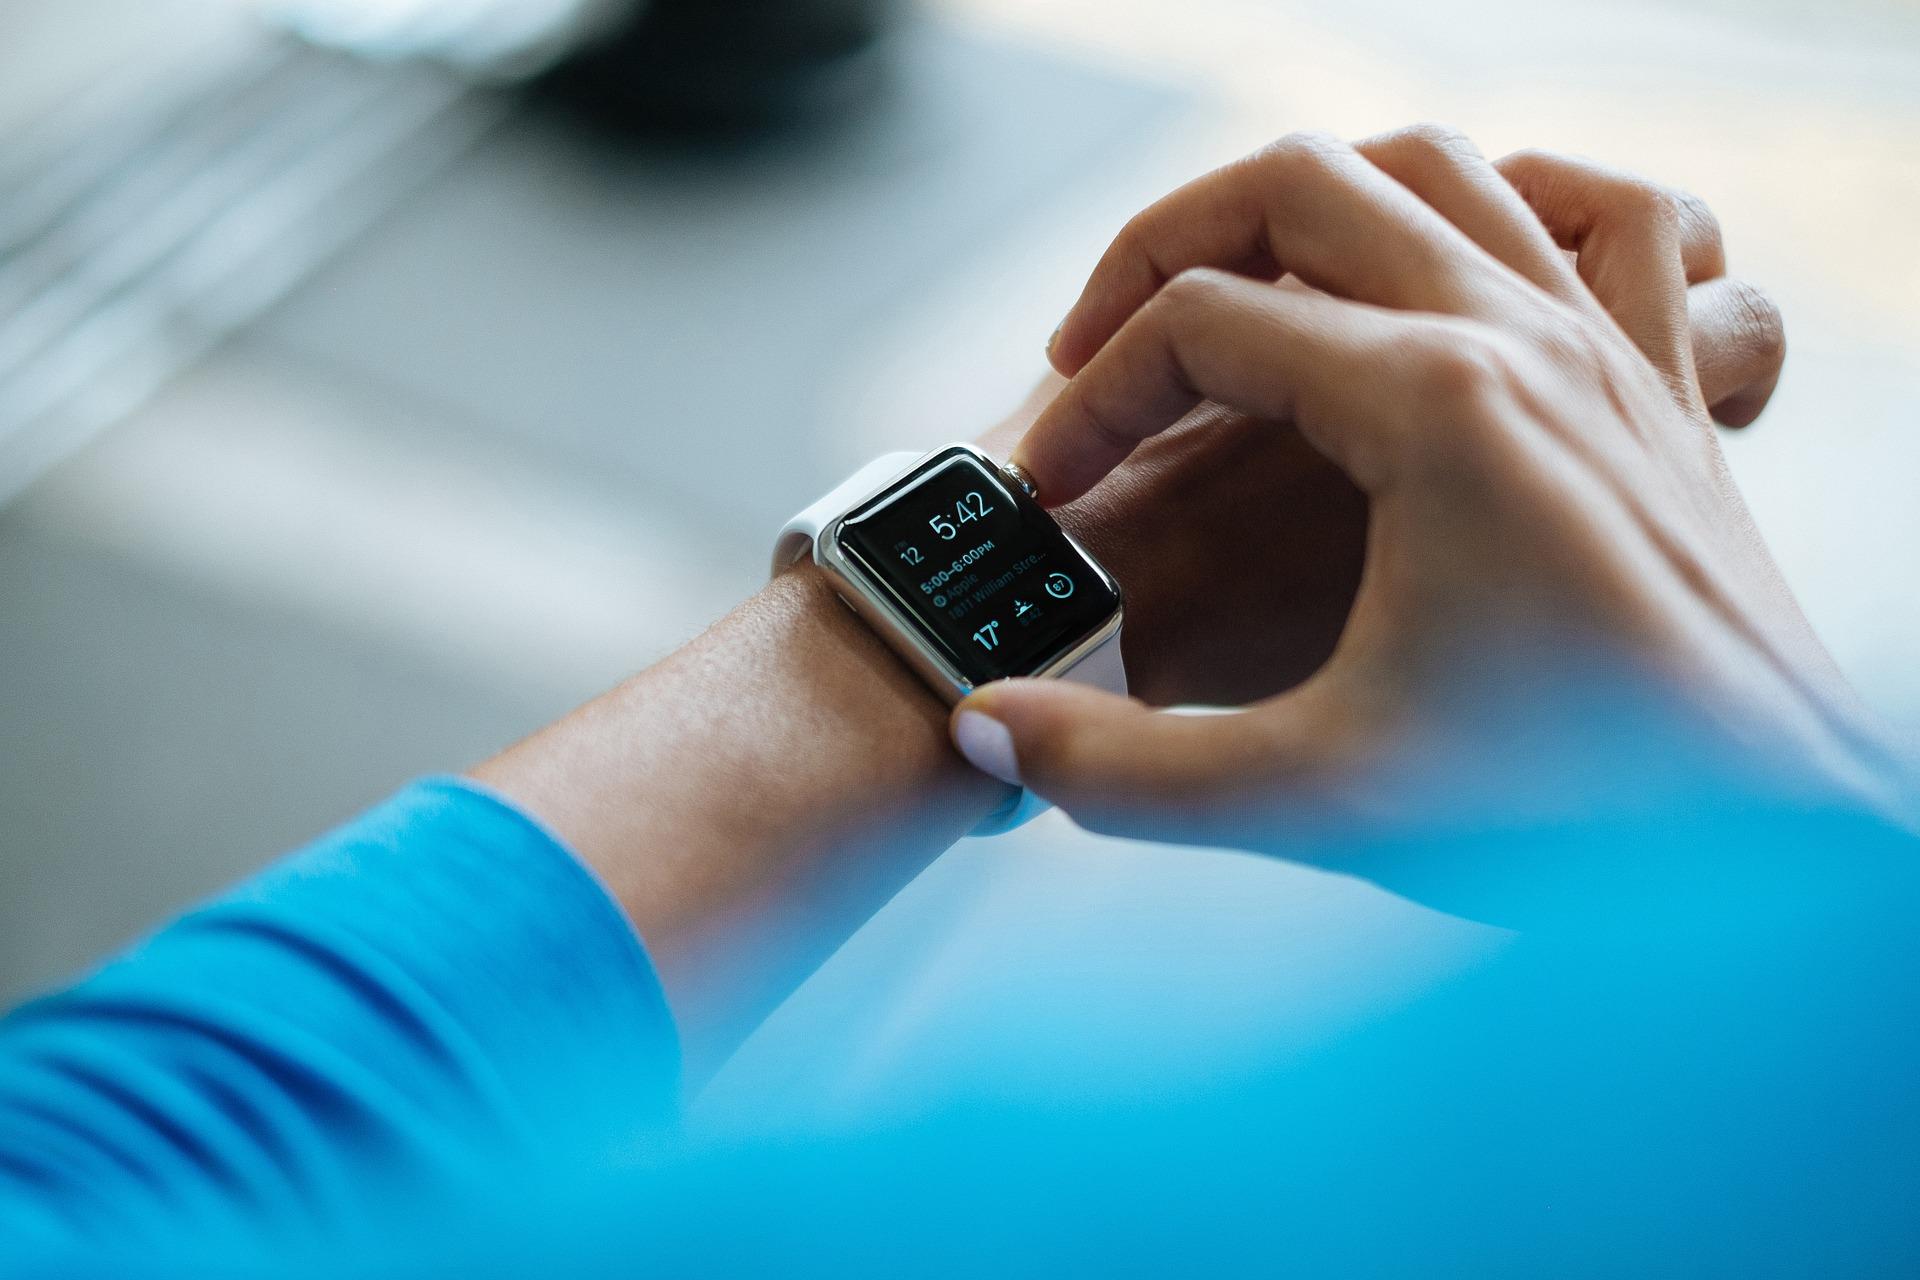 smartwatch-828786_1920.jpg